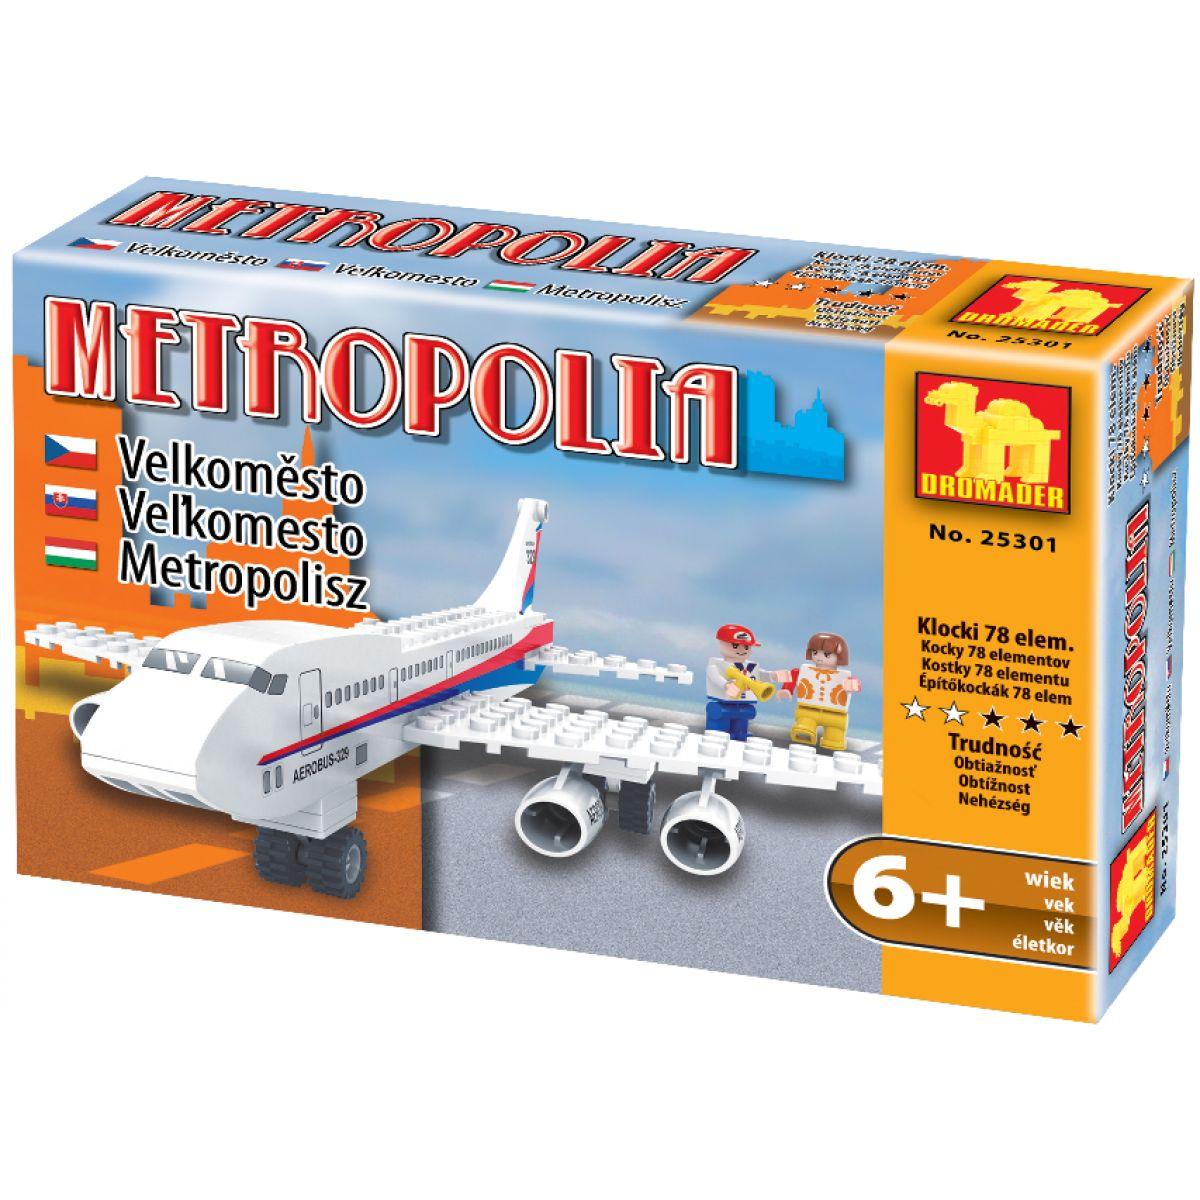 Dromader 25301 Letadlo 78ks